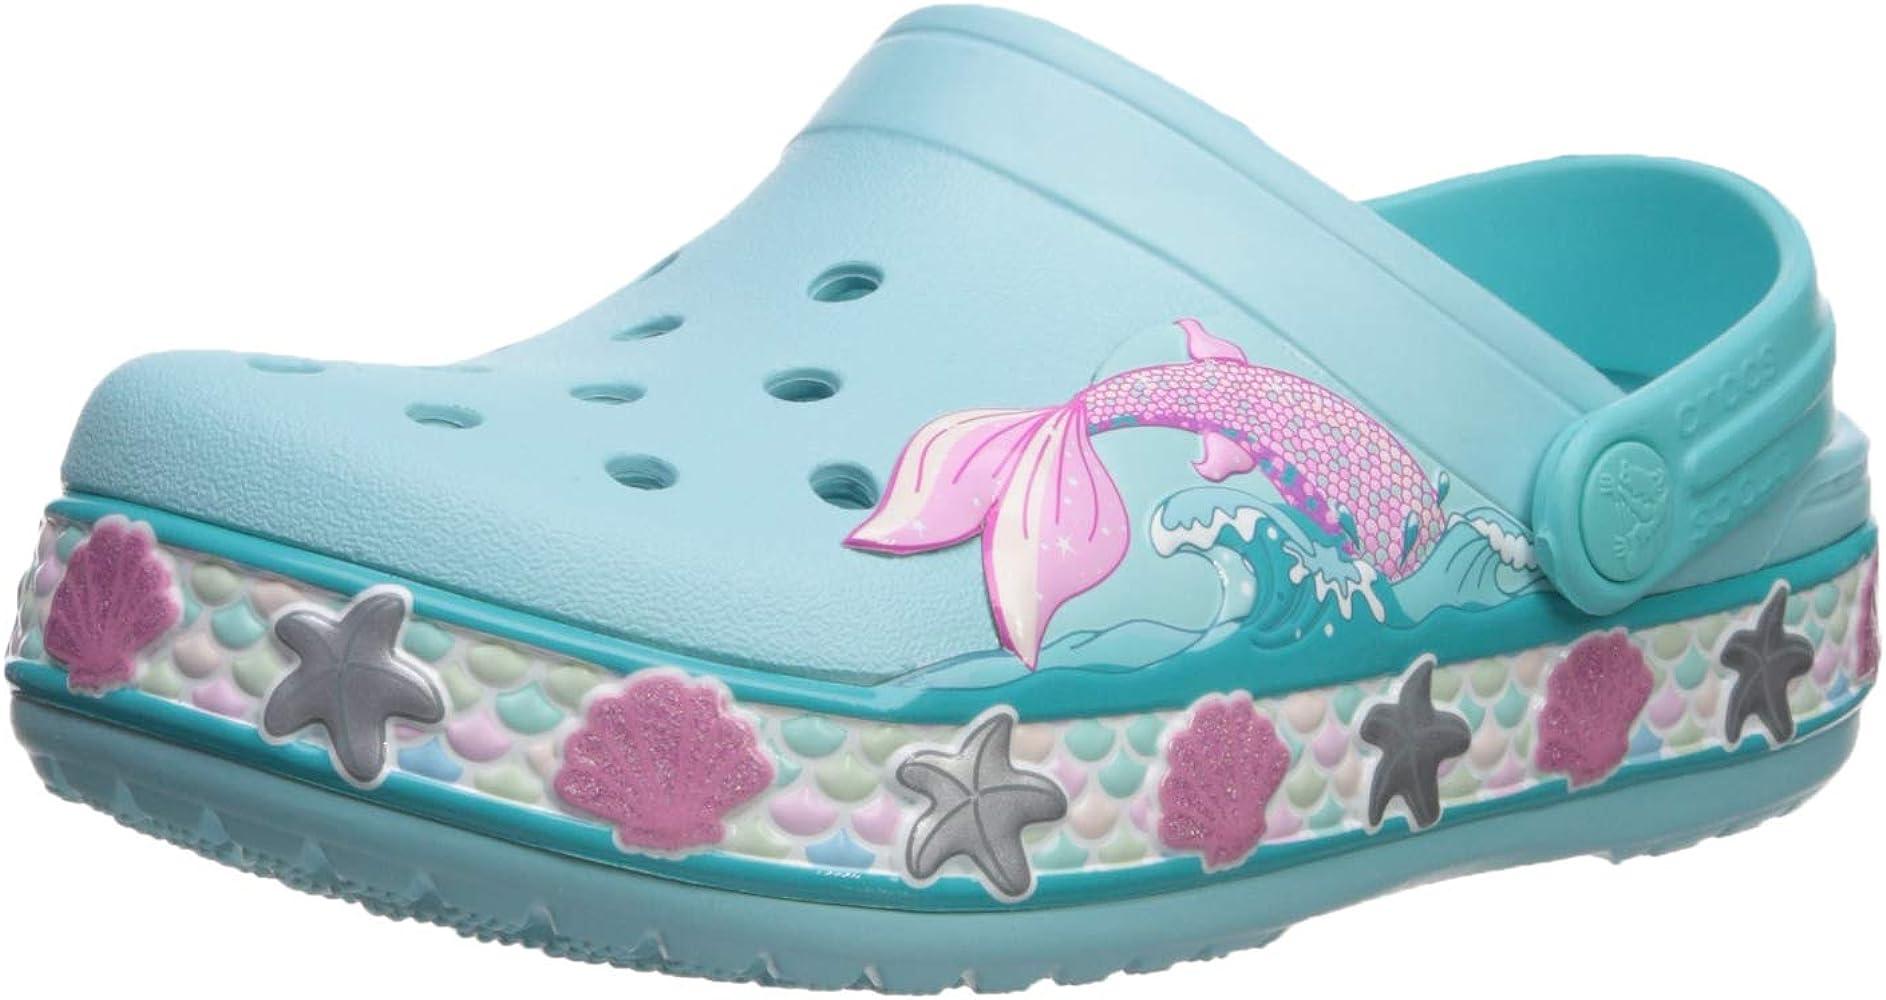 Crocs Kids' Fun Lab Mermaid Band Clog